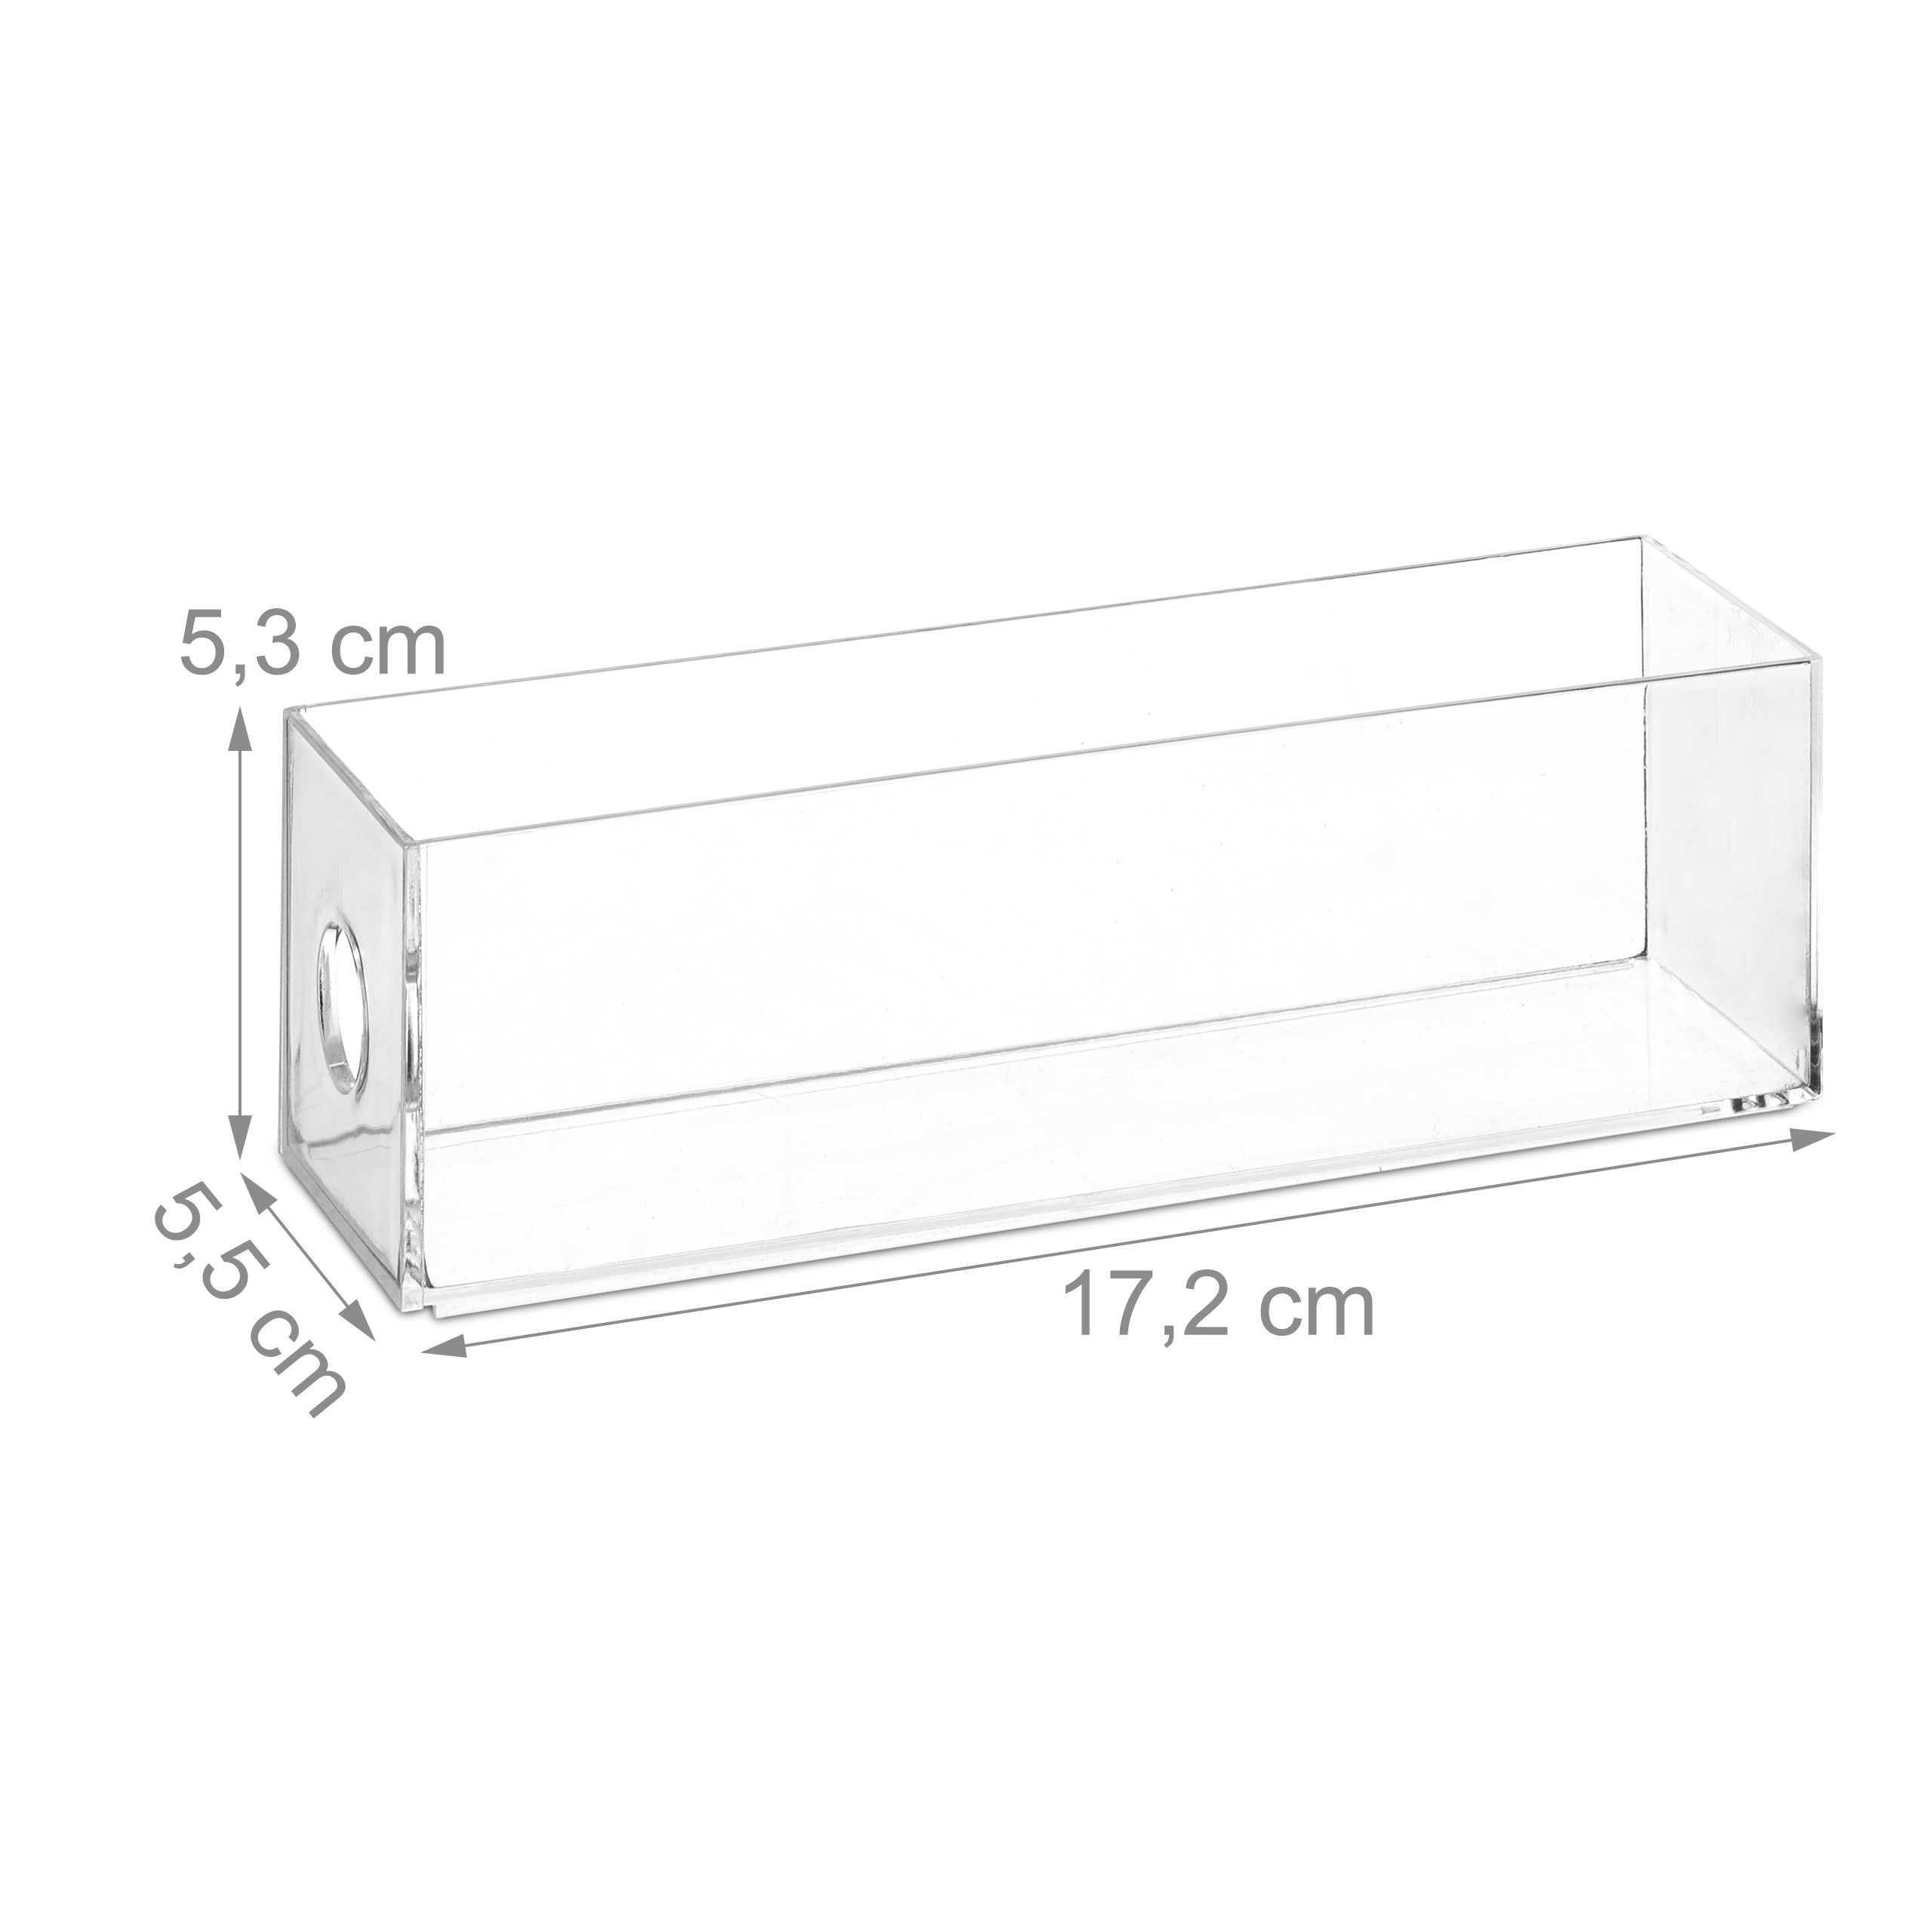 Make-Up-Organizer-Acryl-Schubladenbox-4-Schubladen-Kosmetikorganizer-transparent miniatuur 6